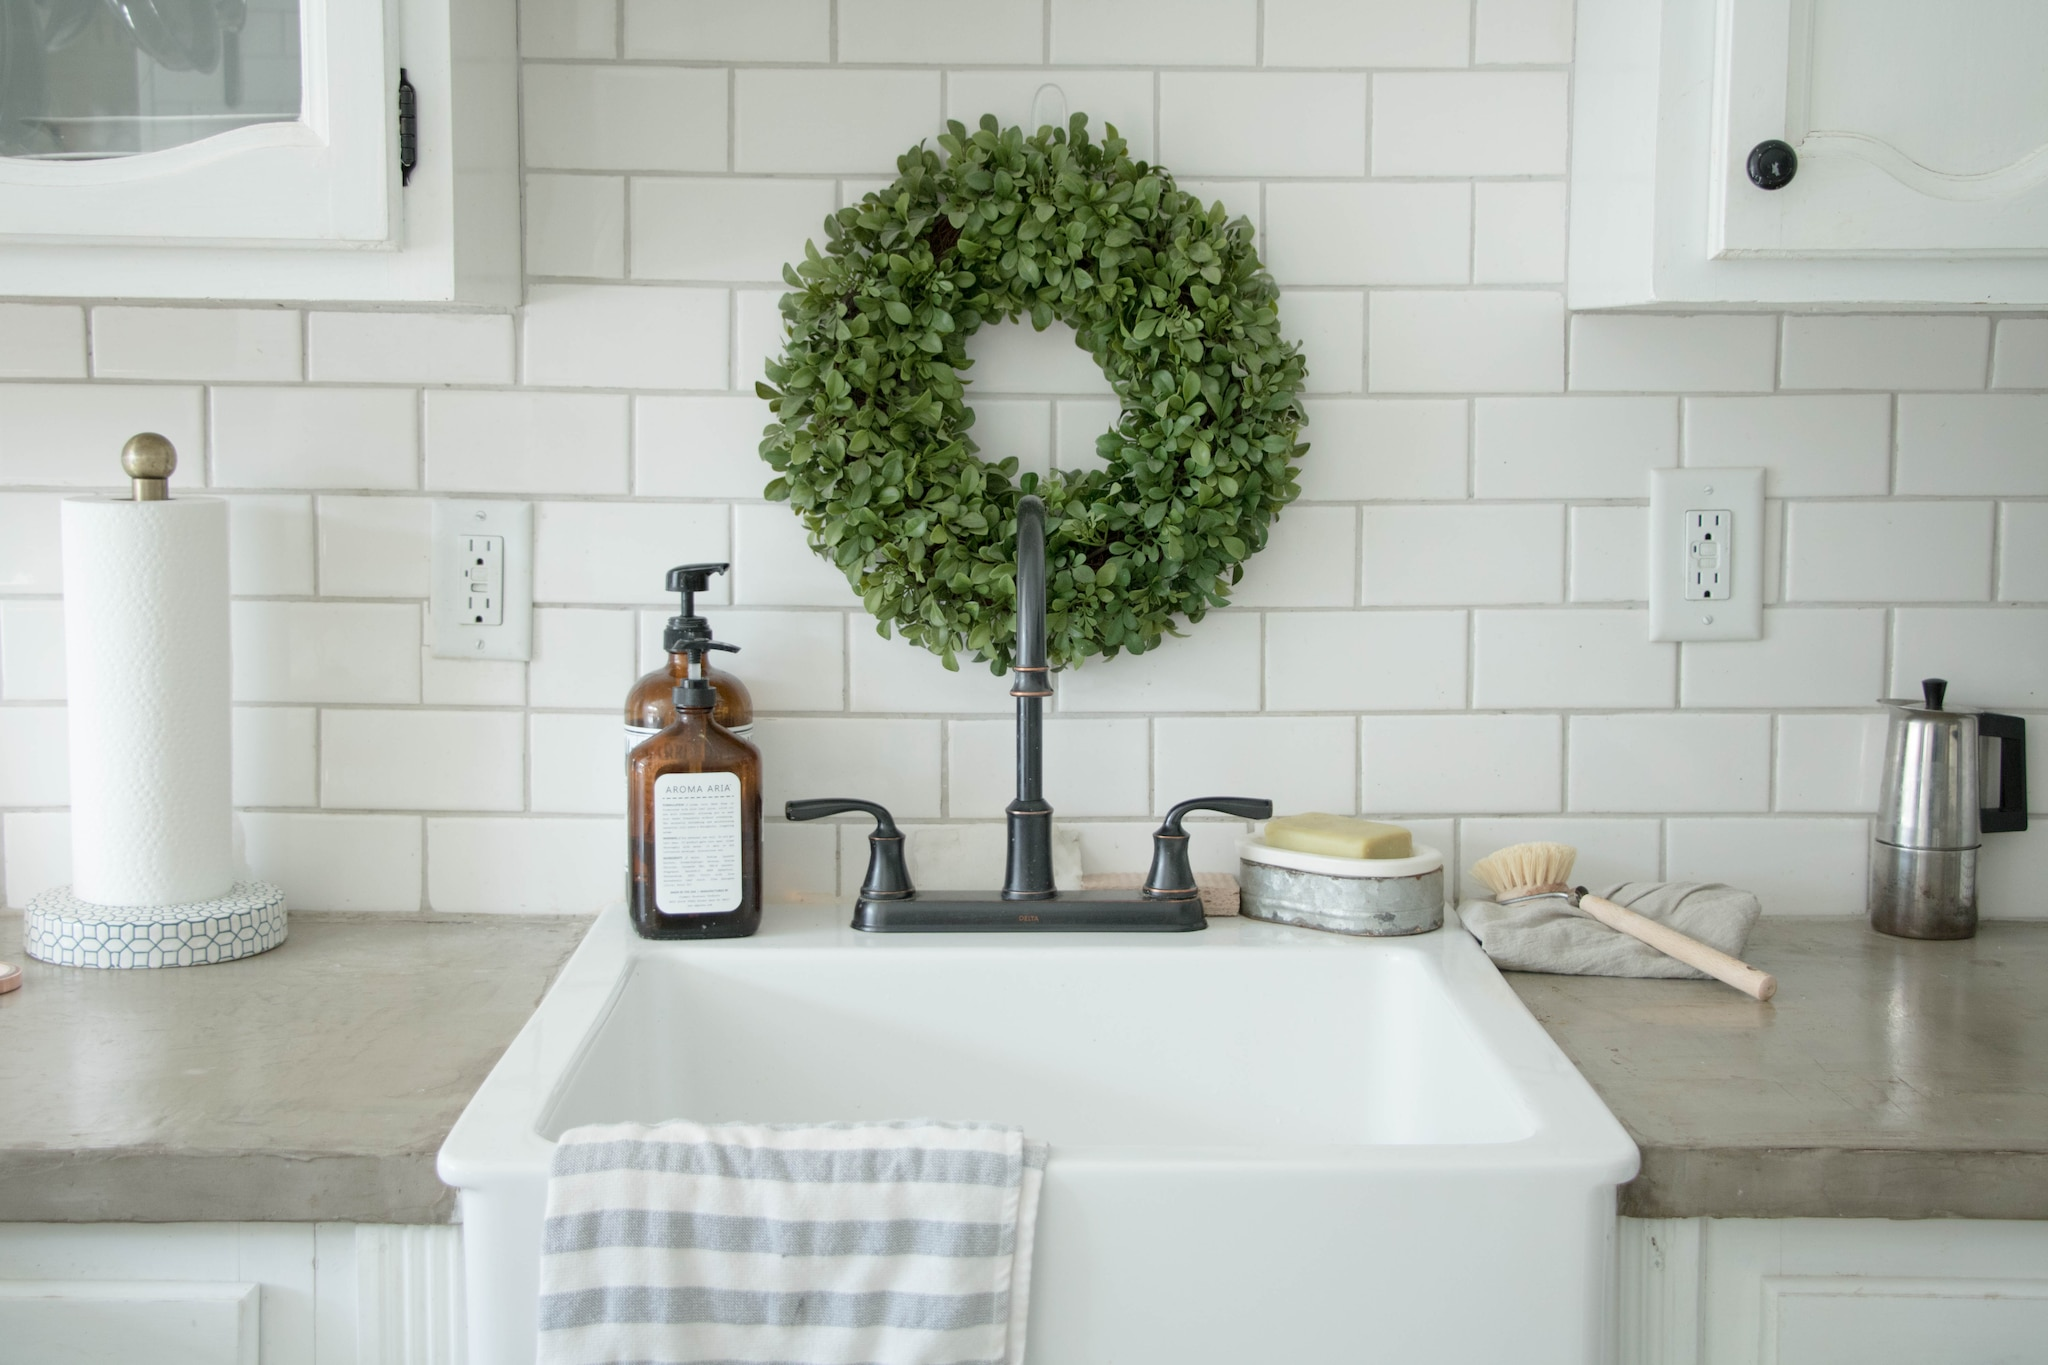 concrete countertop surrounding white sink